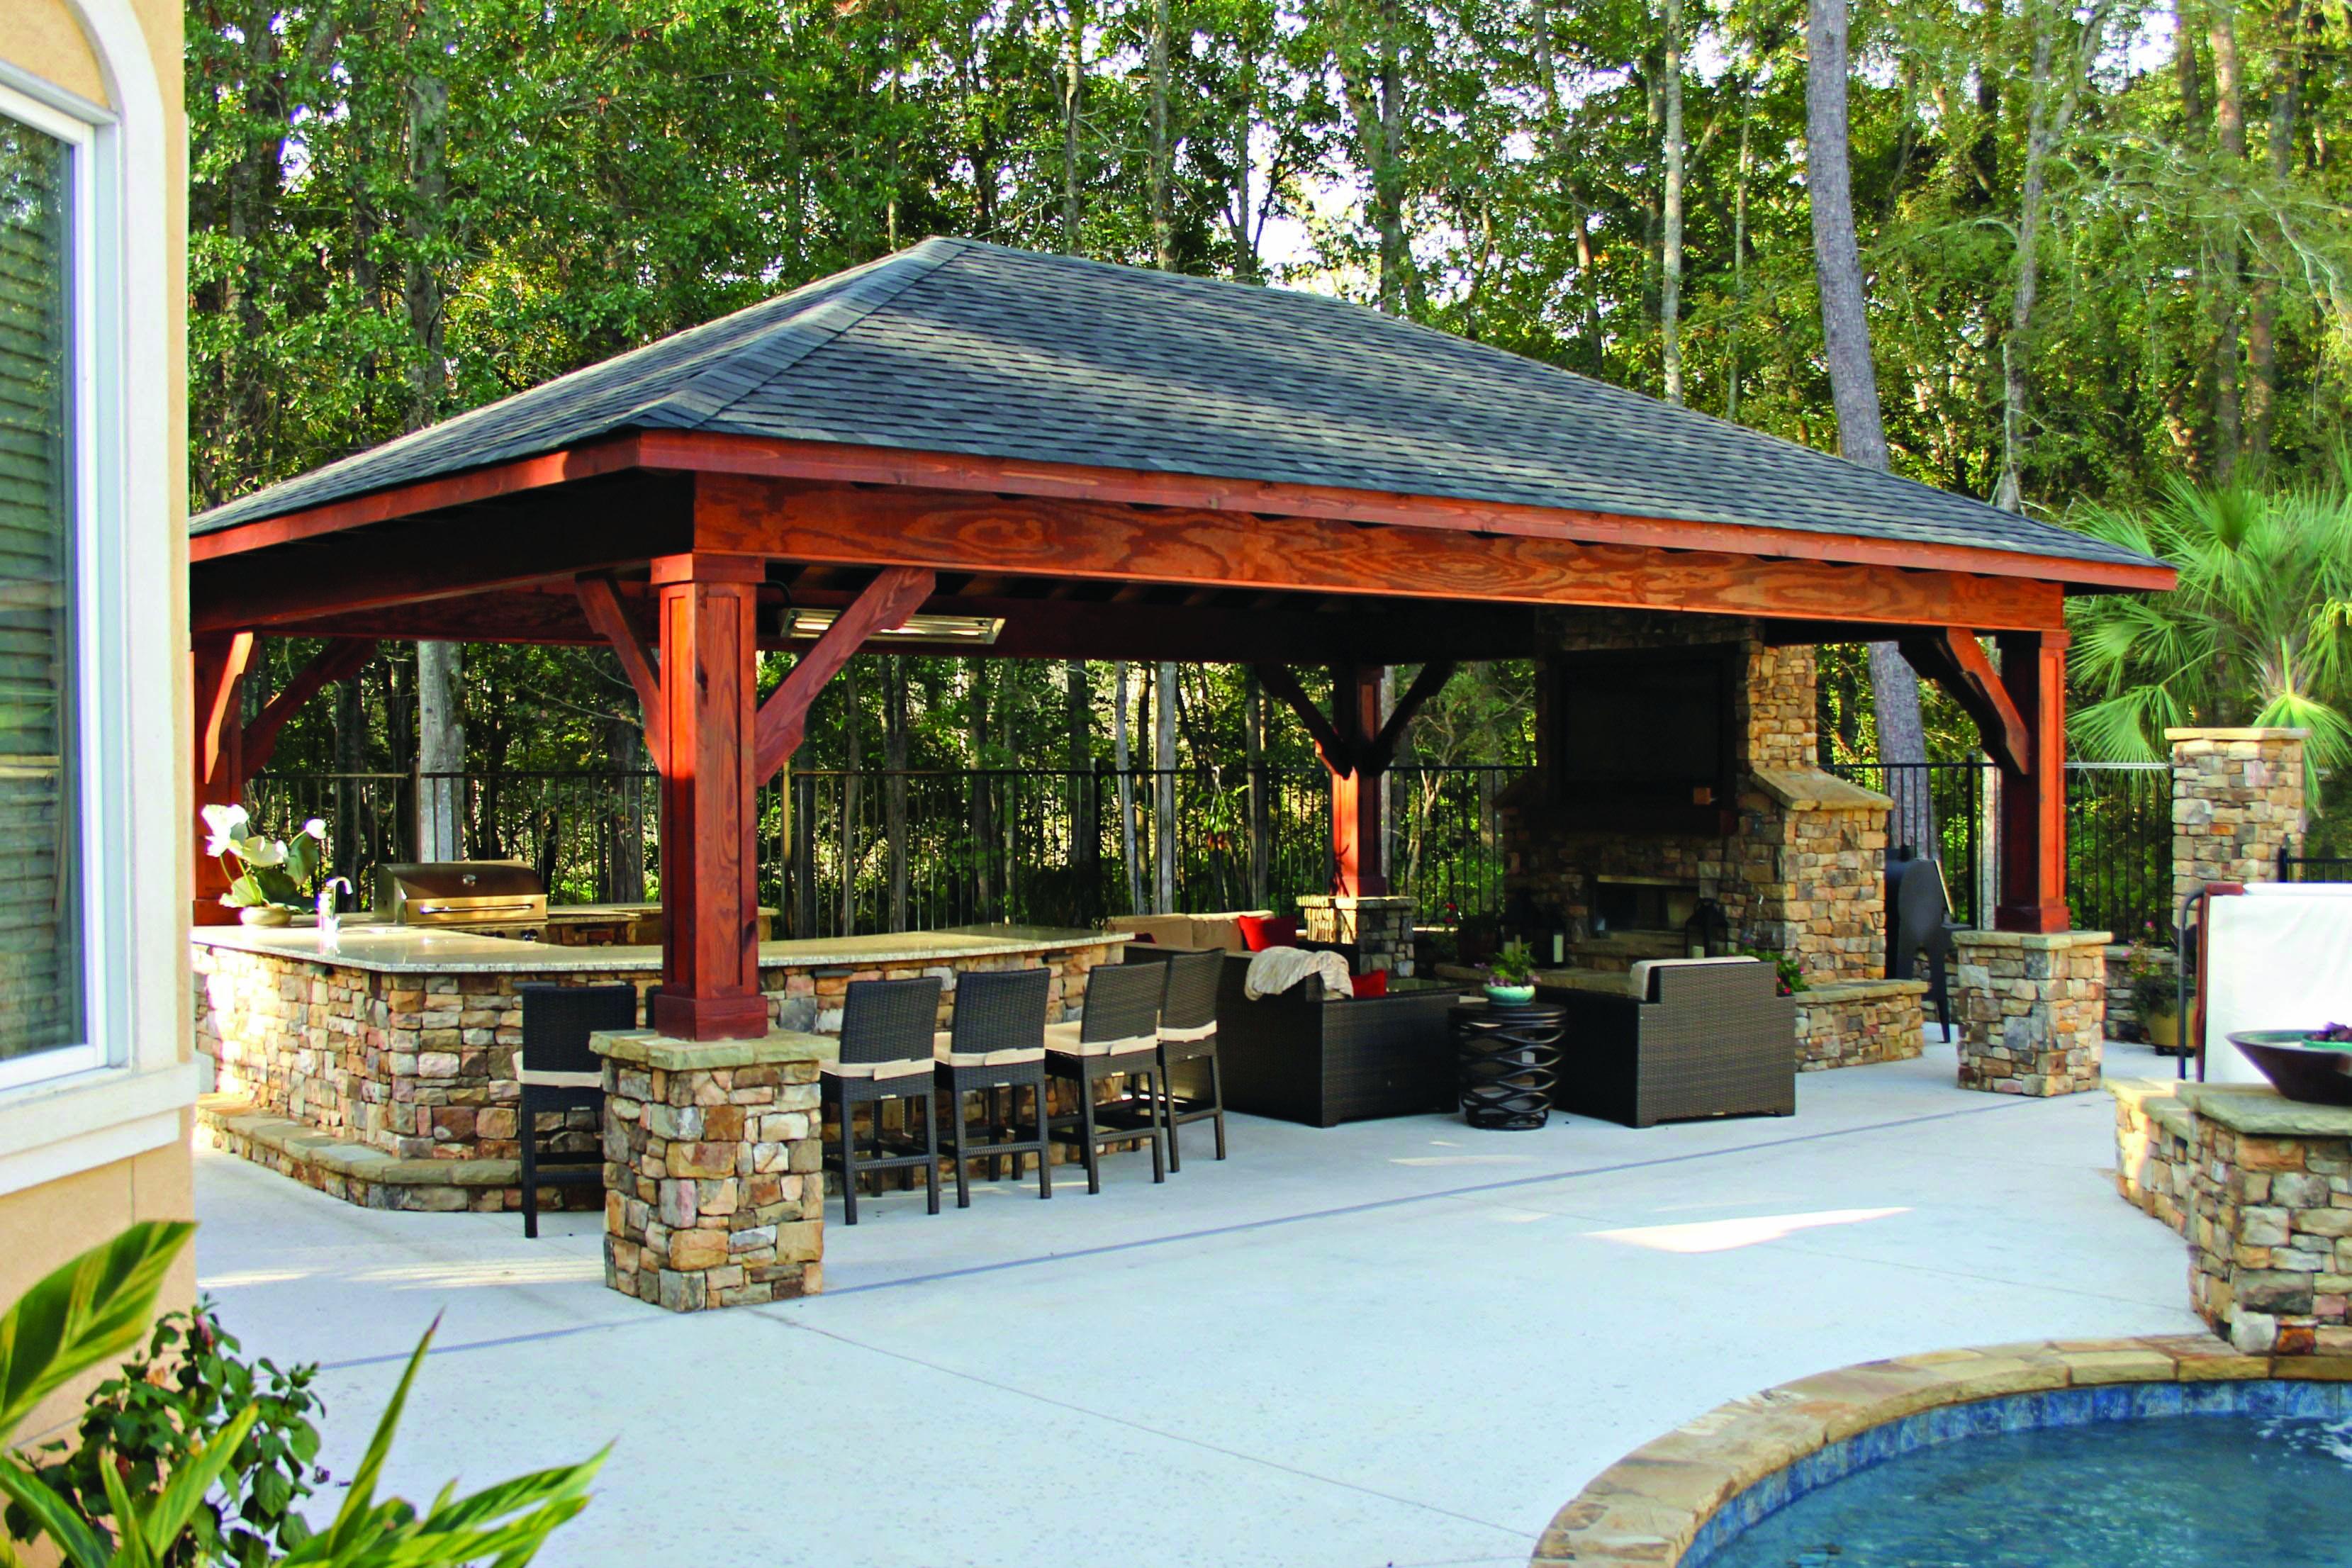 Fire Place Design Concepts For An Elegant Exterior Space Homes Tre Patio Design Backyard Pavilion Outdoor Kitchen Patio